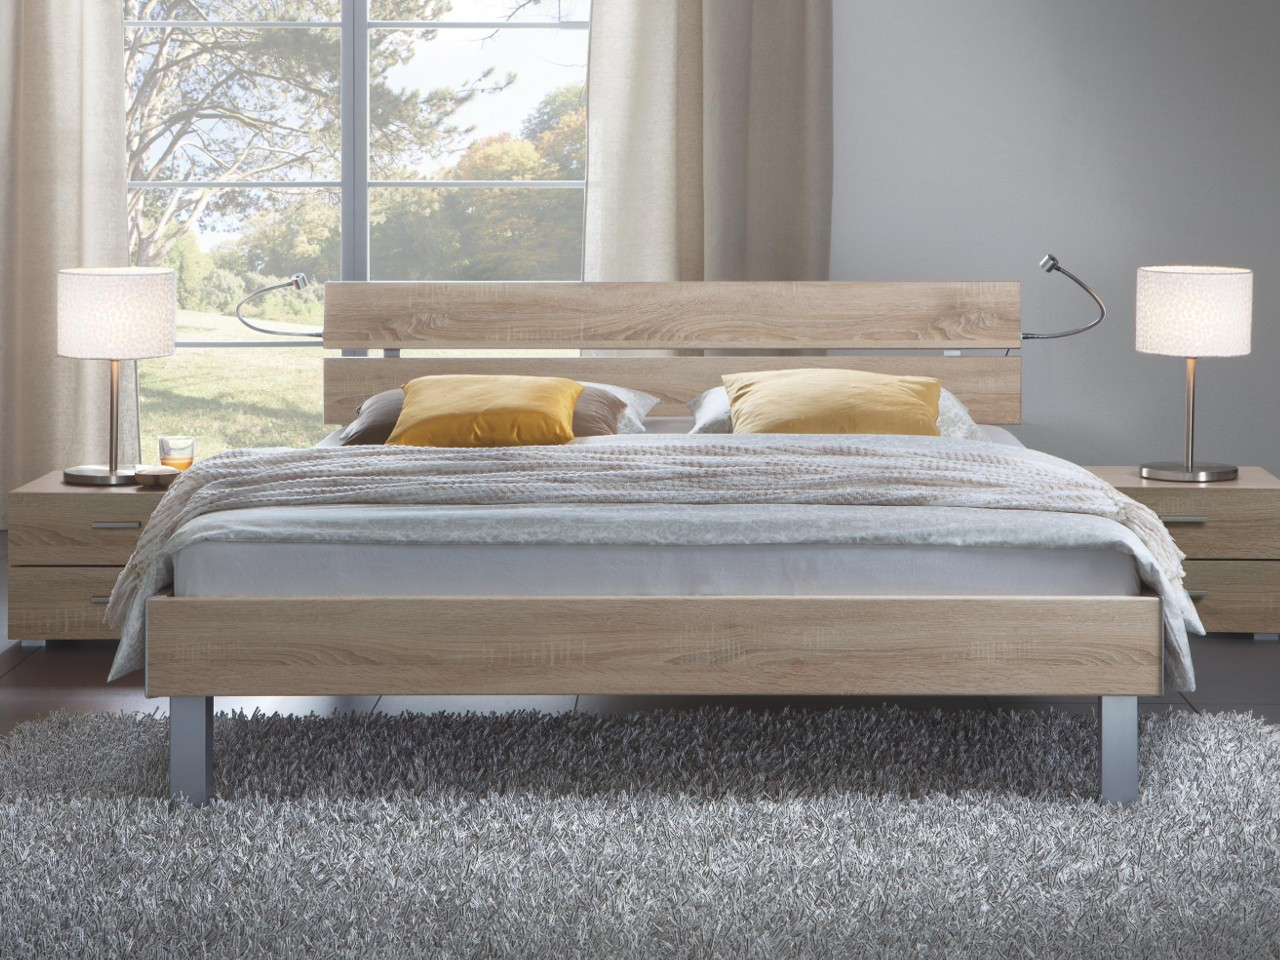 bett 180x200 preis vergleich 2016. Black Bedroom Furniture Sets. Home Design Ideas